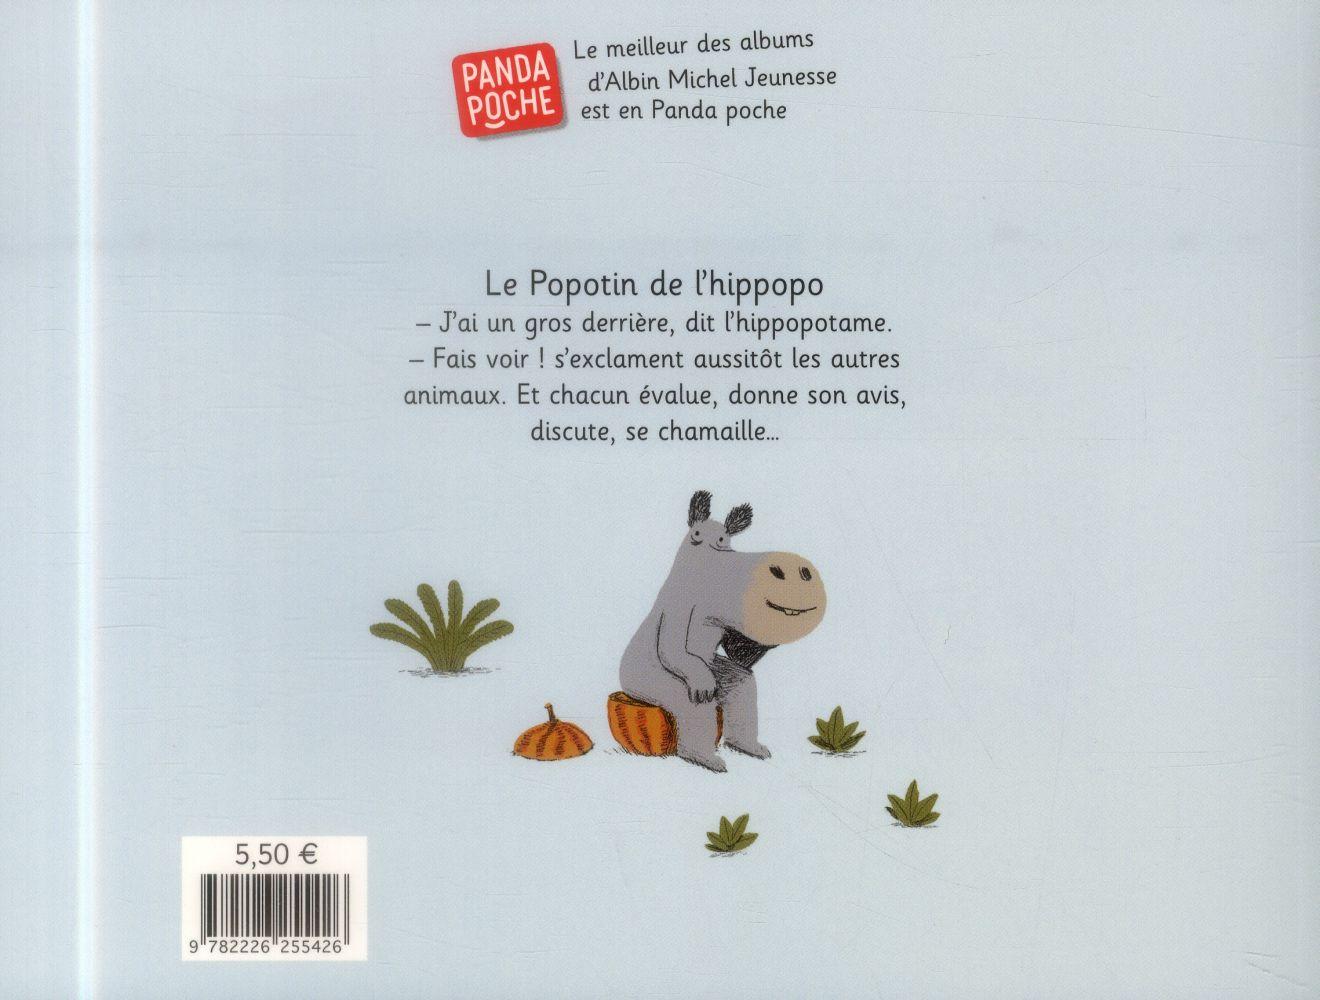 Le popotin de l'hippopo